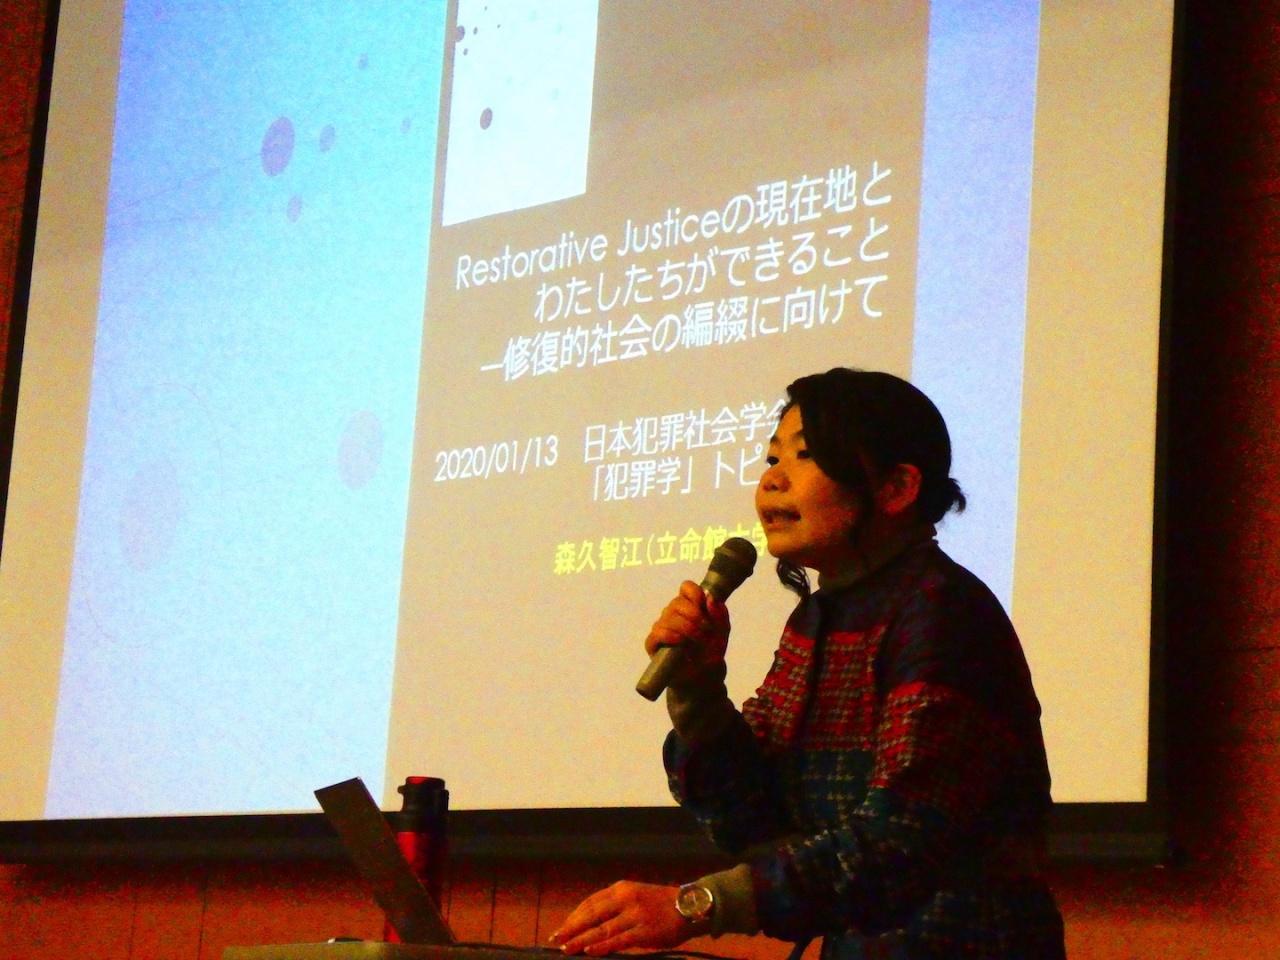 「トピックス:修復的司法」(森久智江・立命館大学)